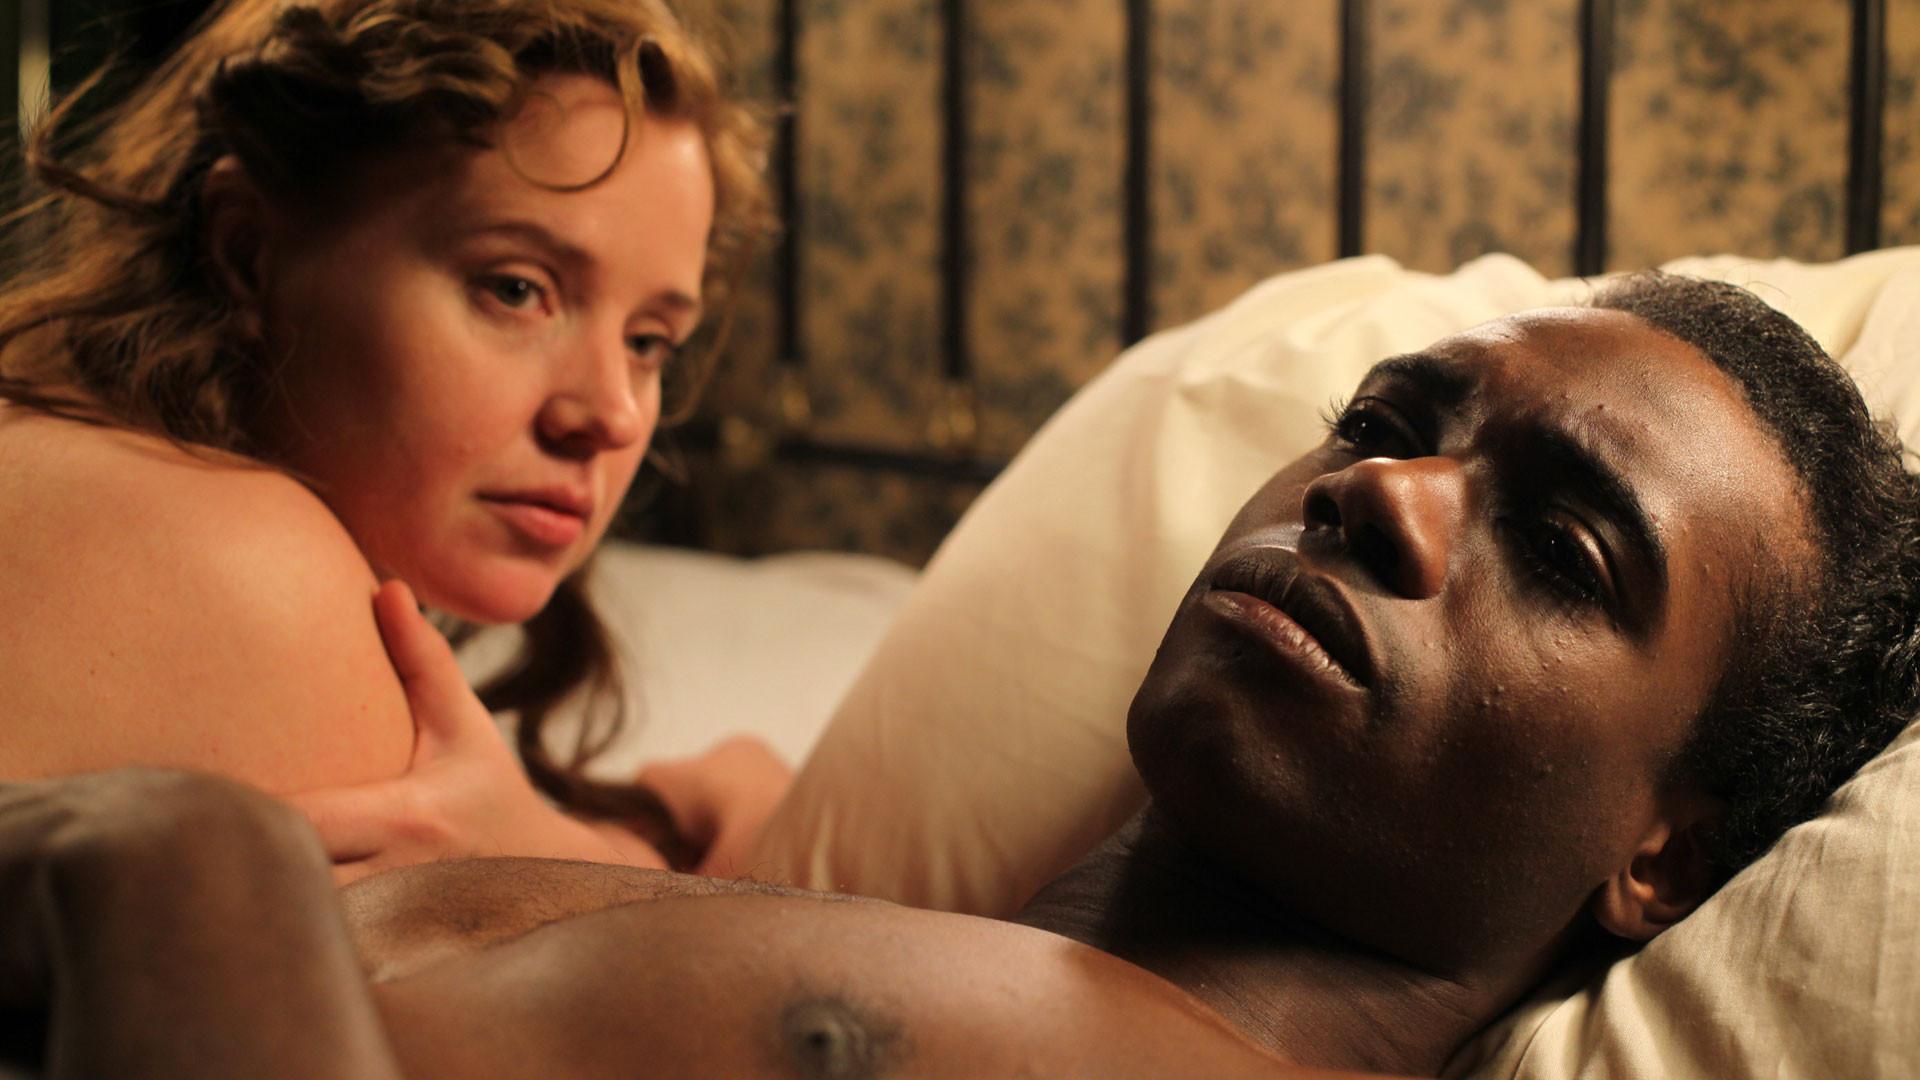 free-interracial-slave-sex-movies-darty-fuk-images